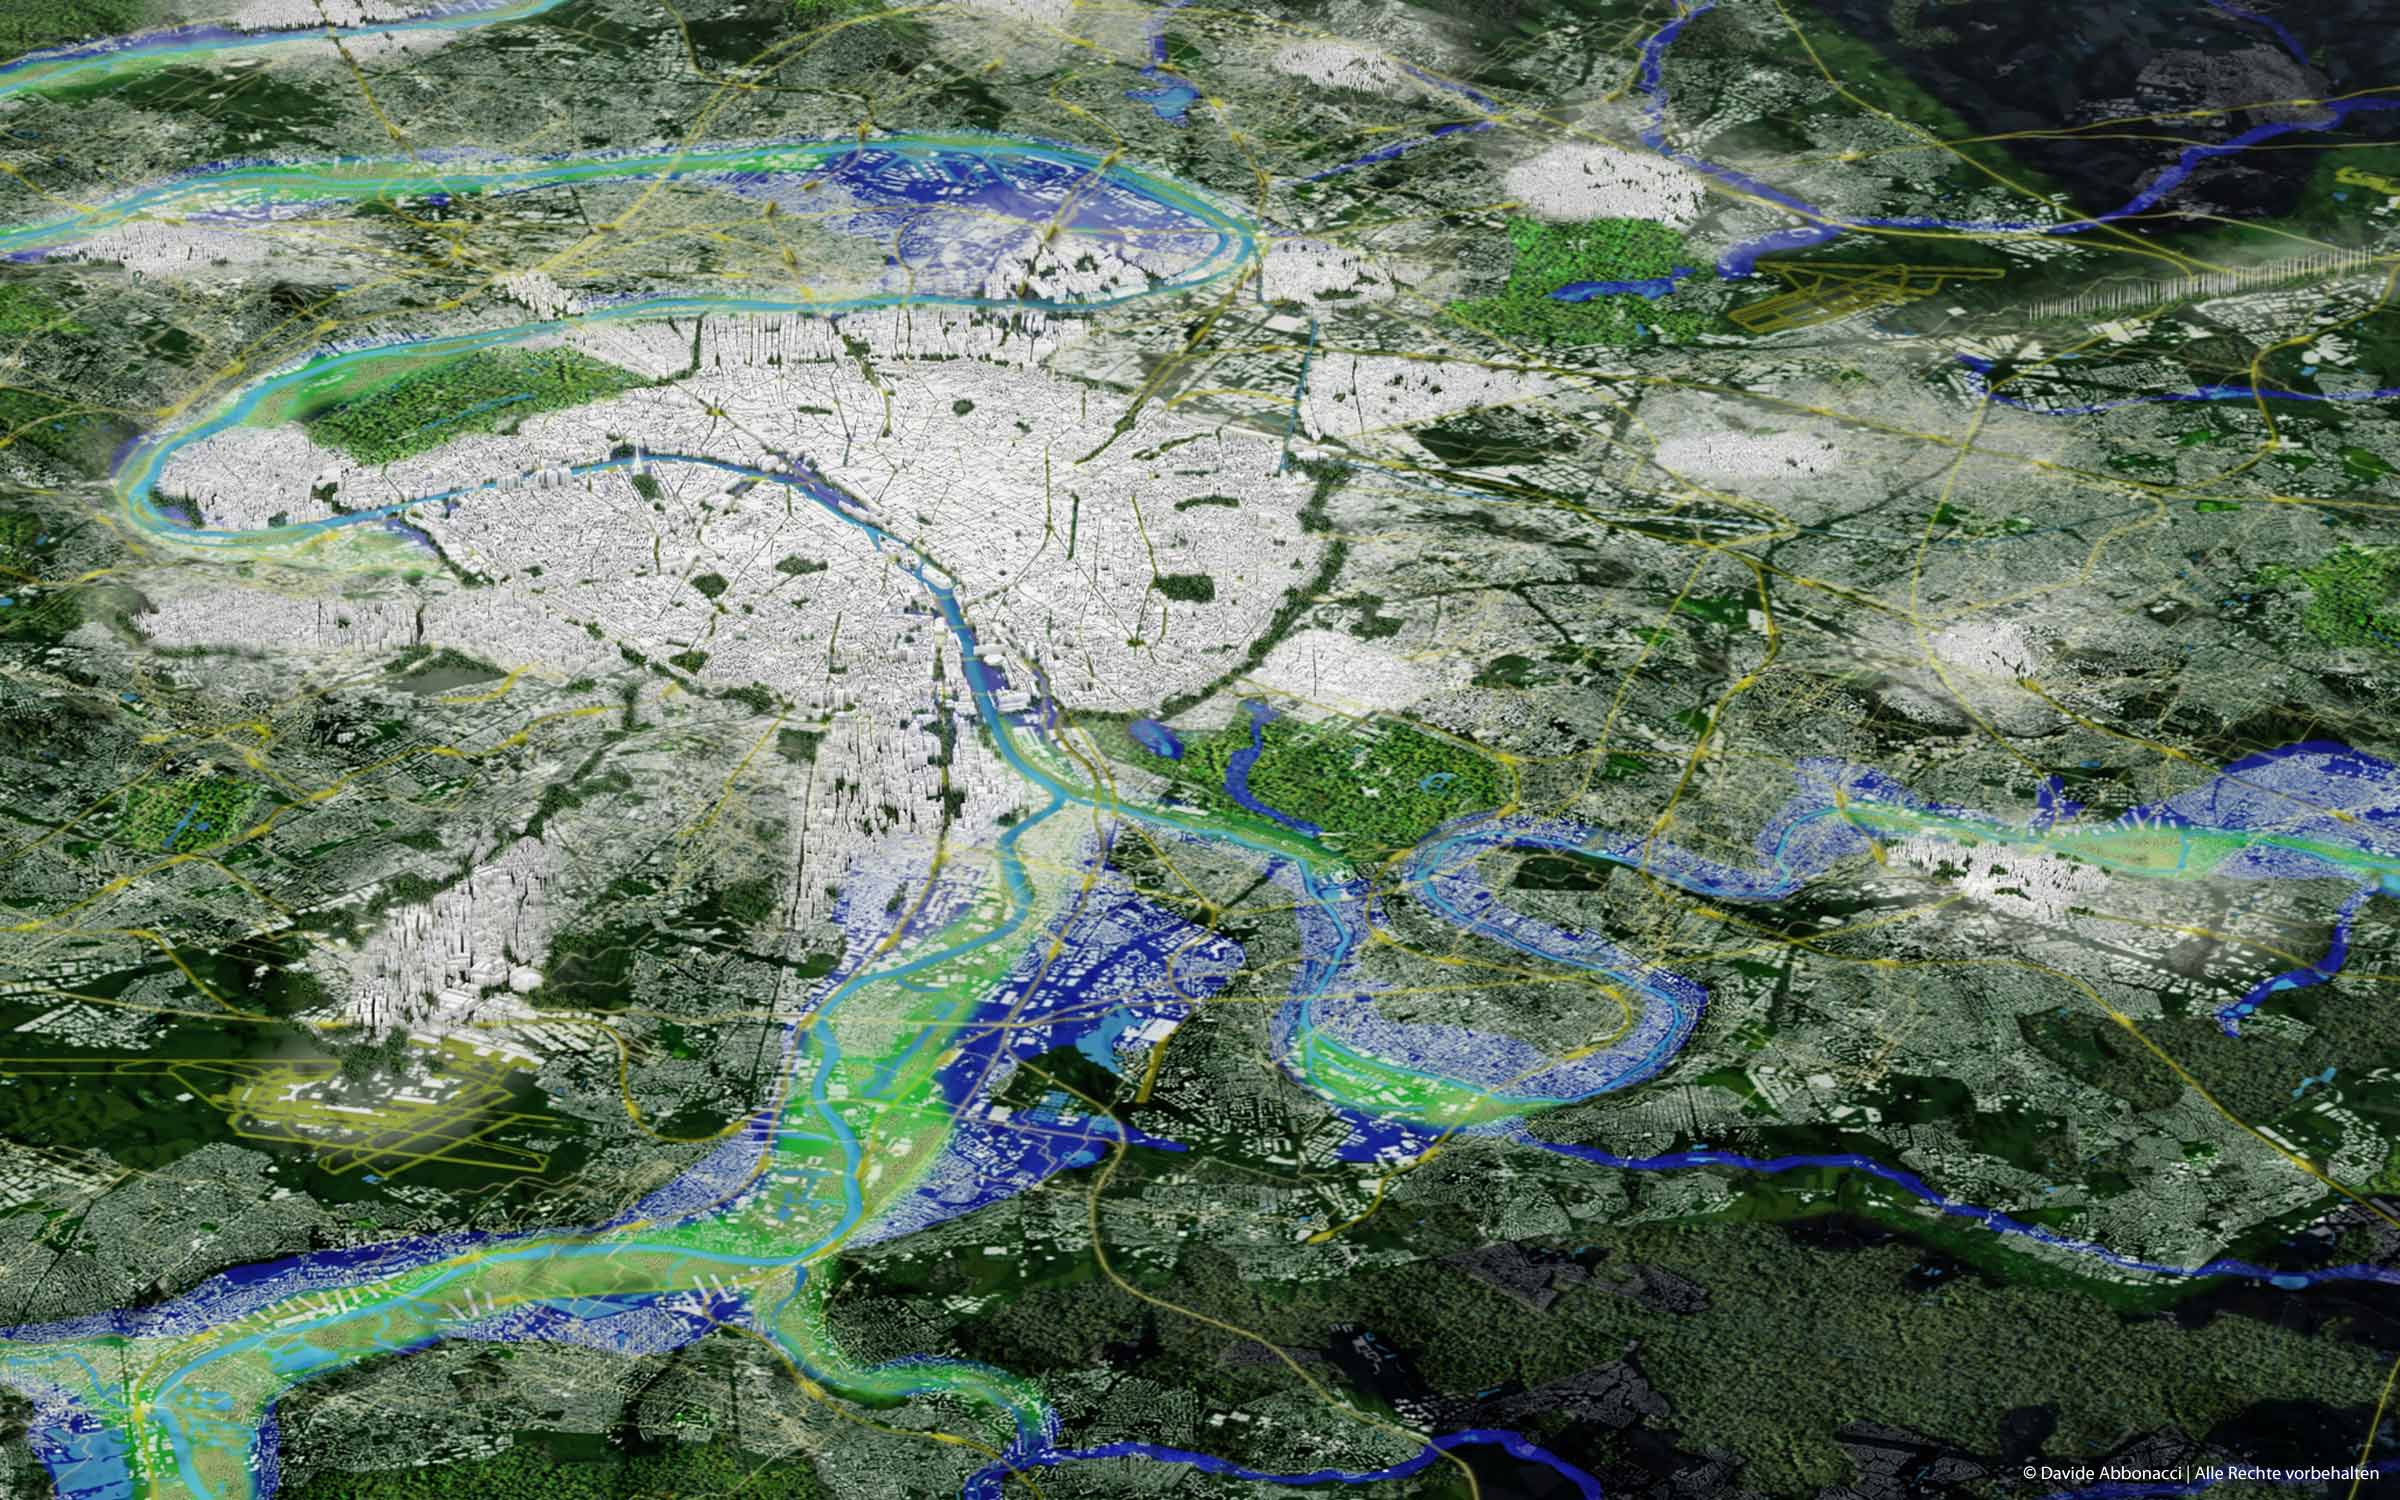 Grand Paris - Métropole Douce - Propositions for the Post-Kyoto Metropolis | LIN Architects Urbanists | 2009 Masterplan